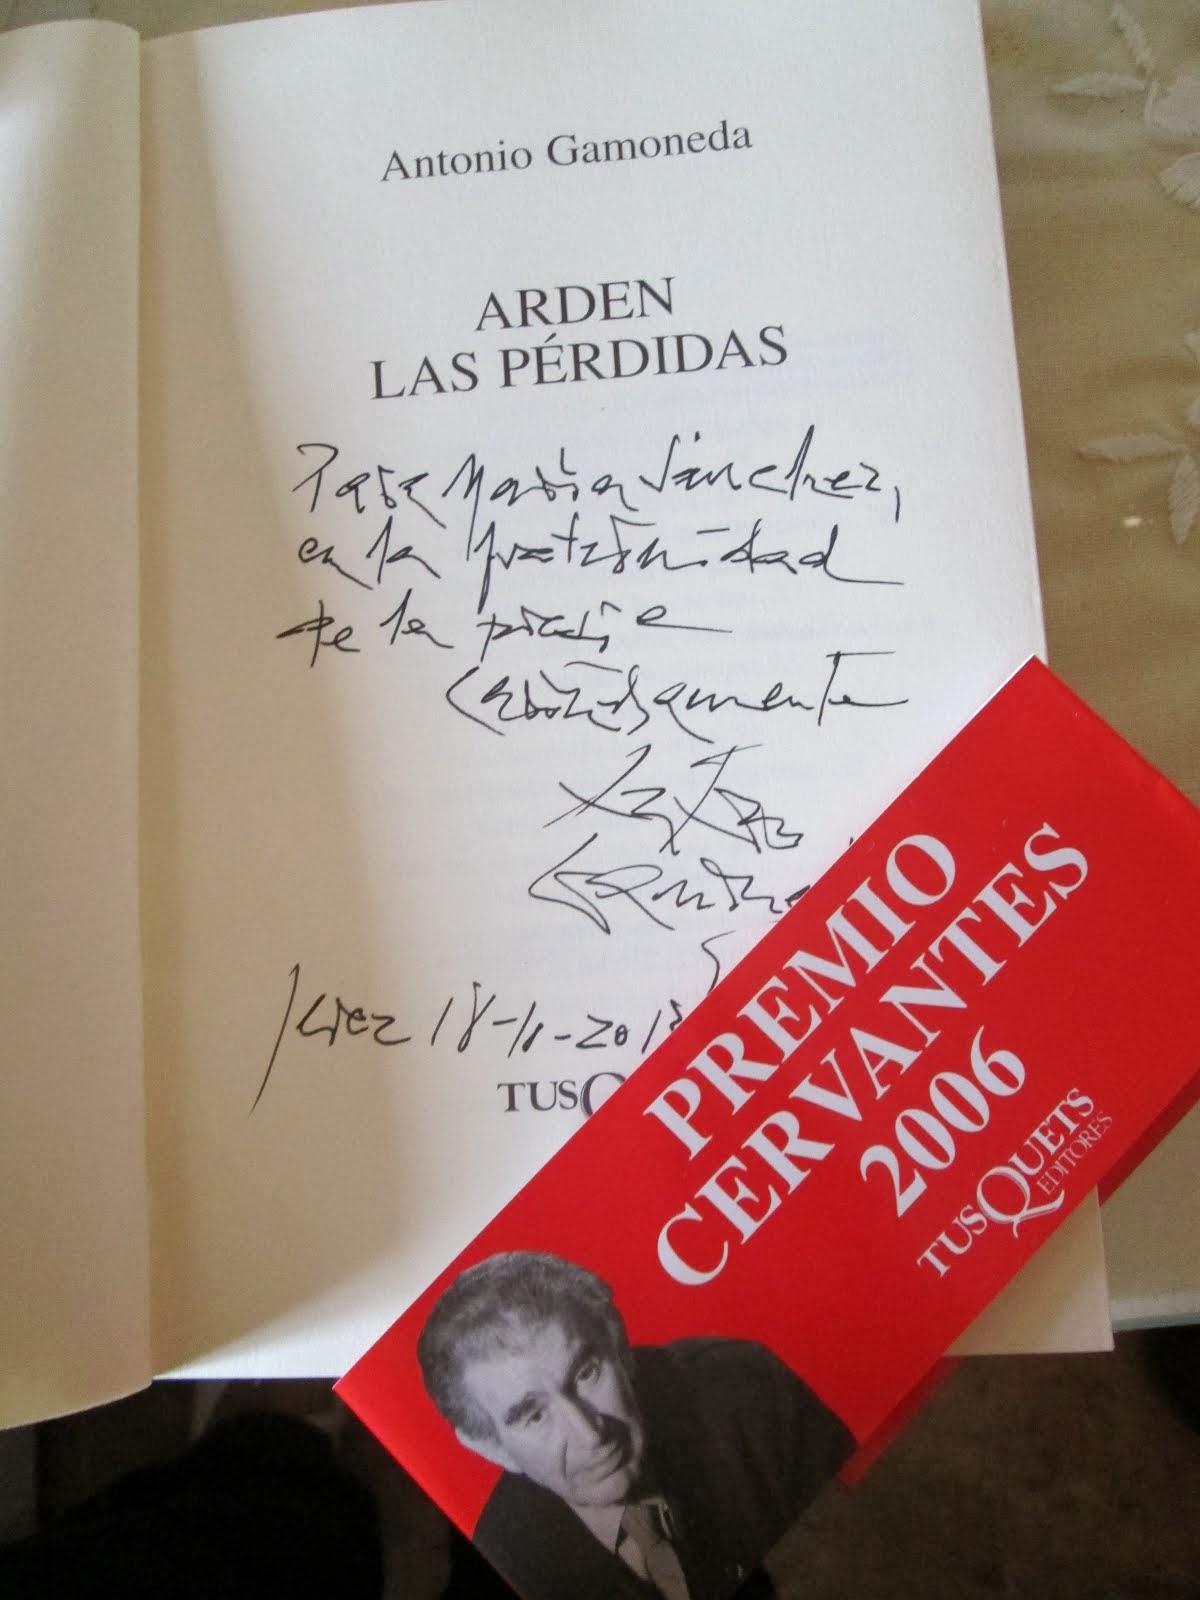 XV C. Caballero Bonald, Los premios Cervantes, 2013